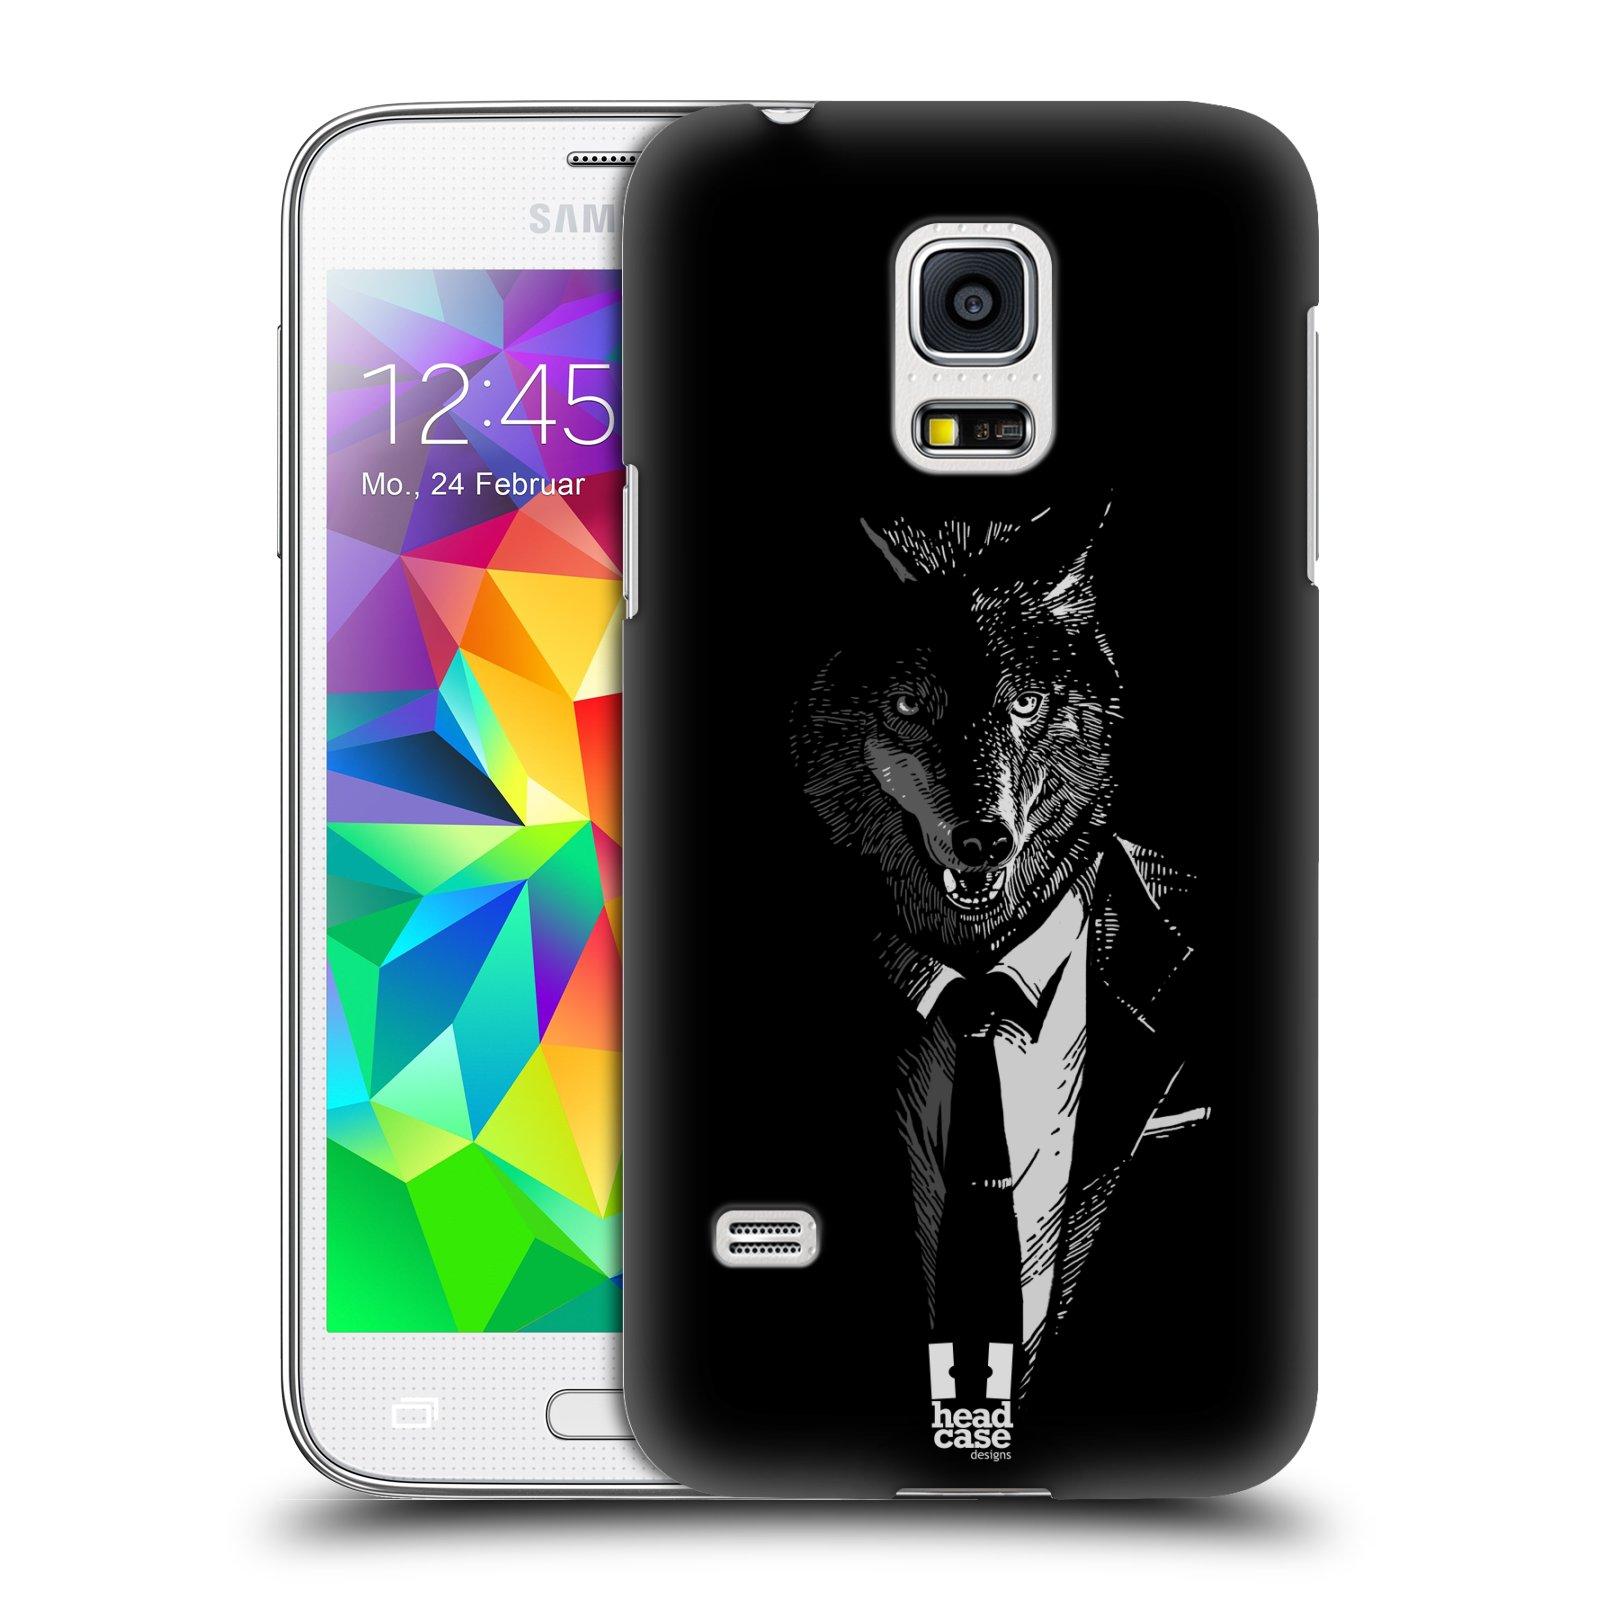 HEAD CASE plastový obal na mobil SAMSUNG Galaxy S5 MINI / S5 MINI DUOS vzor Zvíře v obleku vlk